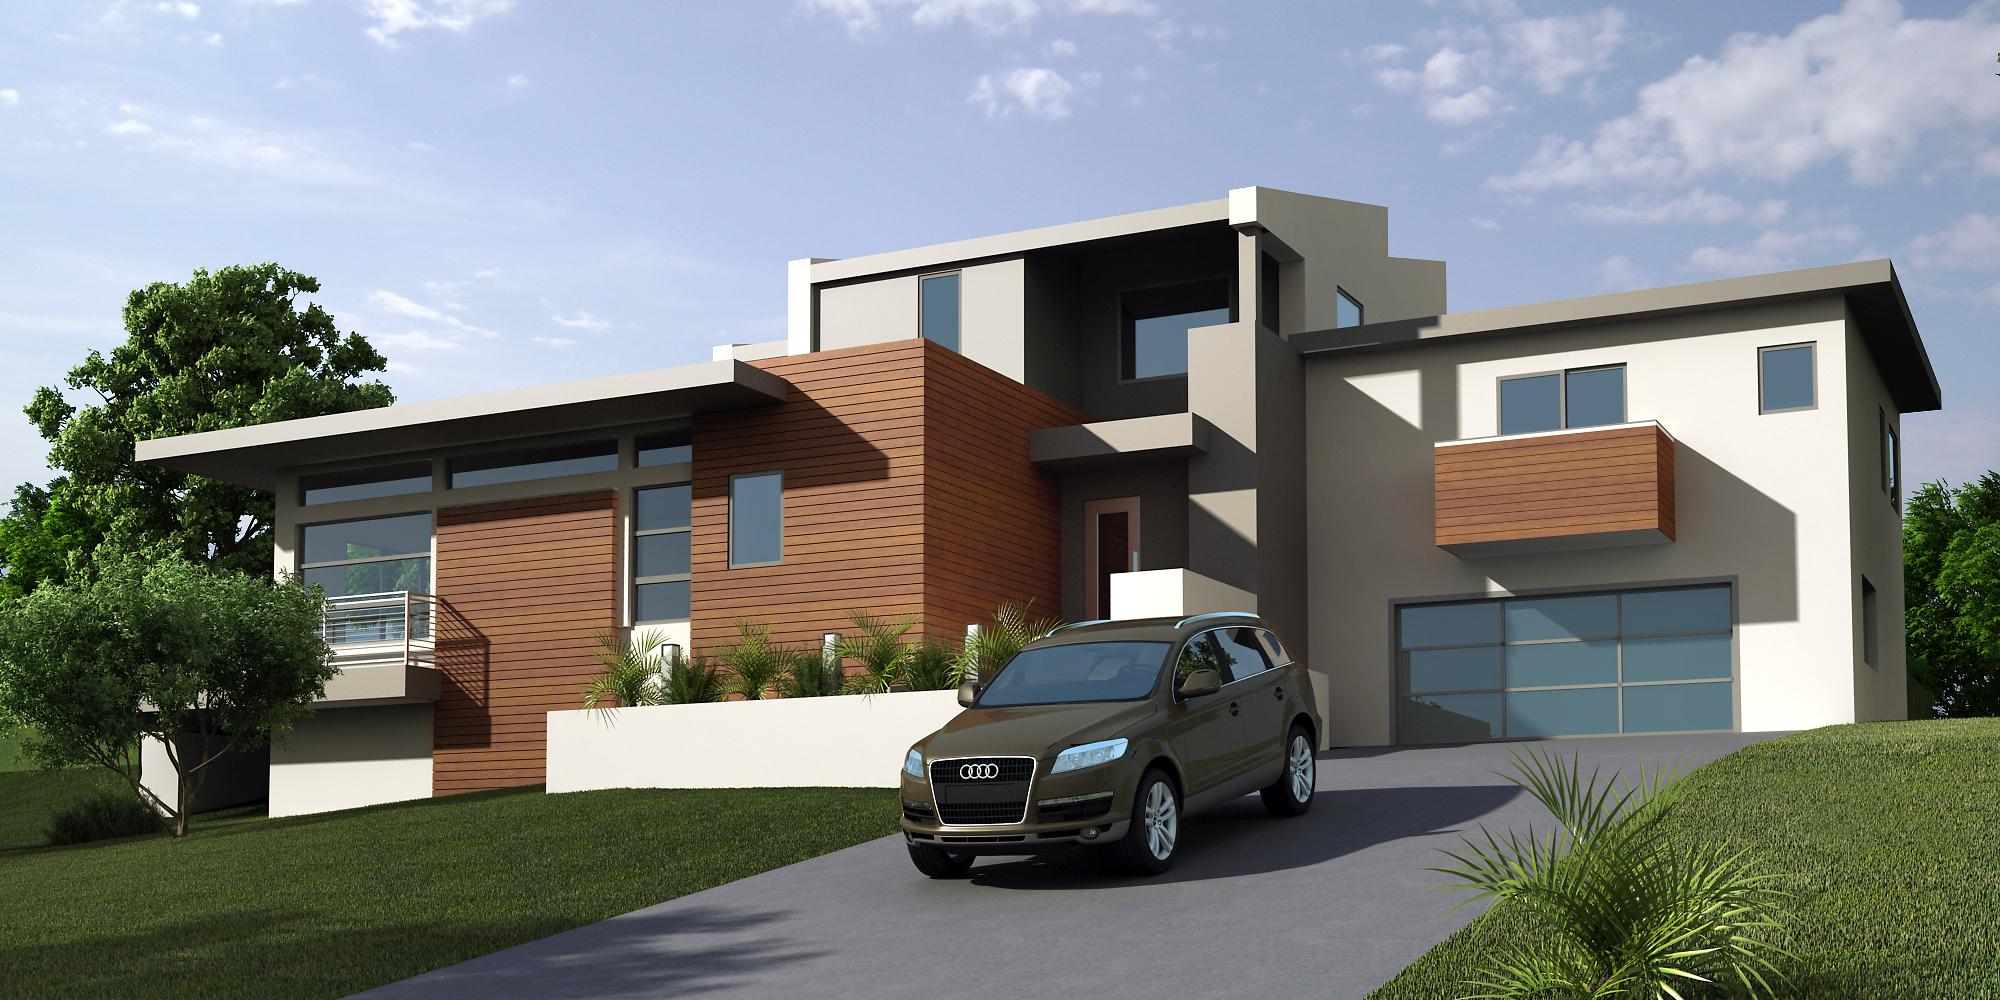 Carlsbad Design Update